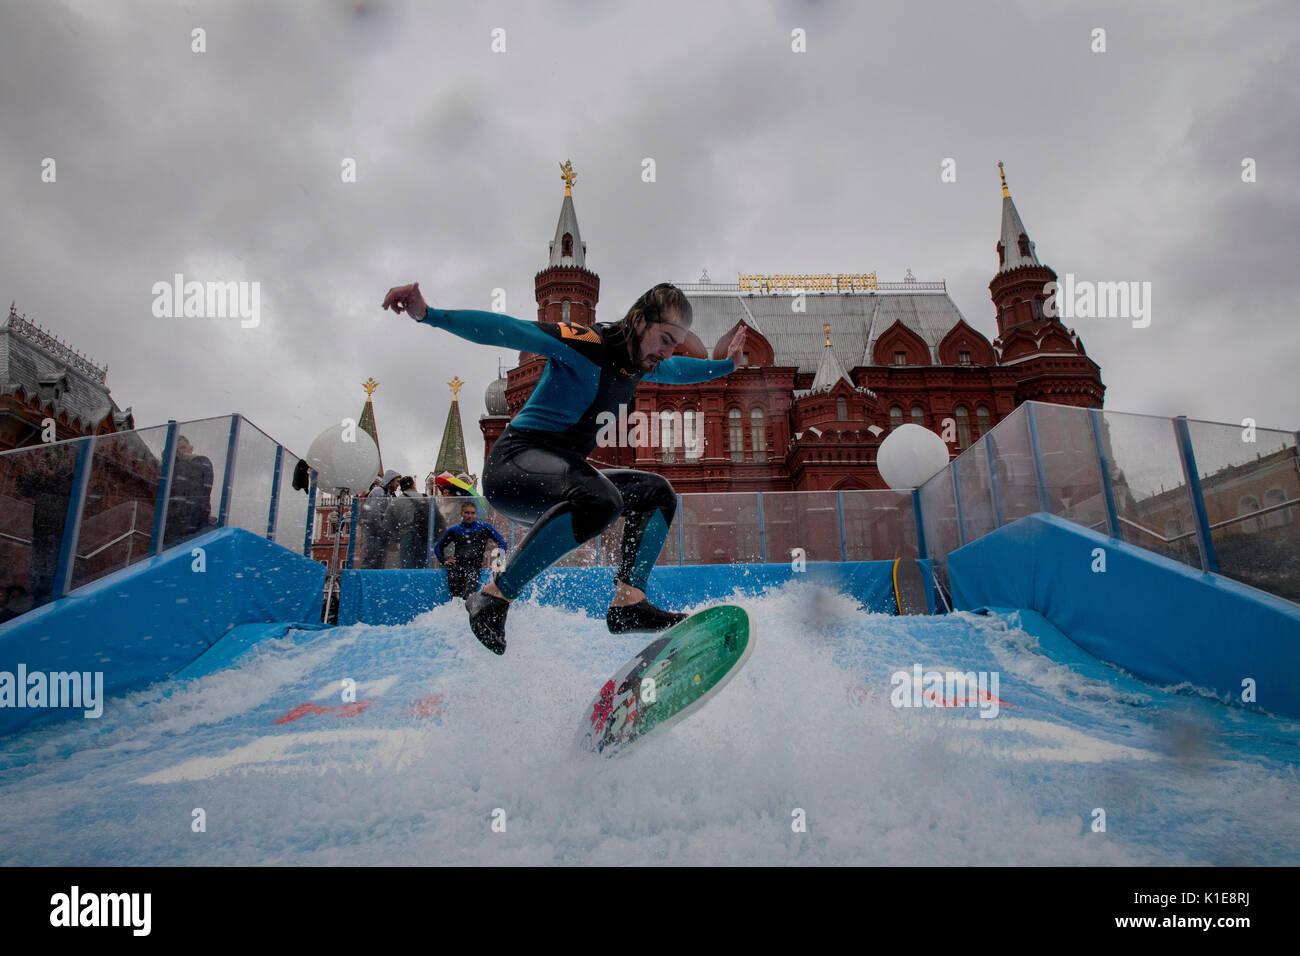 Moscú, Rusia. 25 de agosto de 2017. Un hombre salta sobre flowboard en frente de la plaza roja en el centro de Moscú, Rusia Crédito: Nikolay Vinokurov/Alamy Live News Imagen De Stock